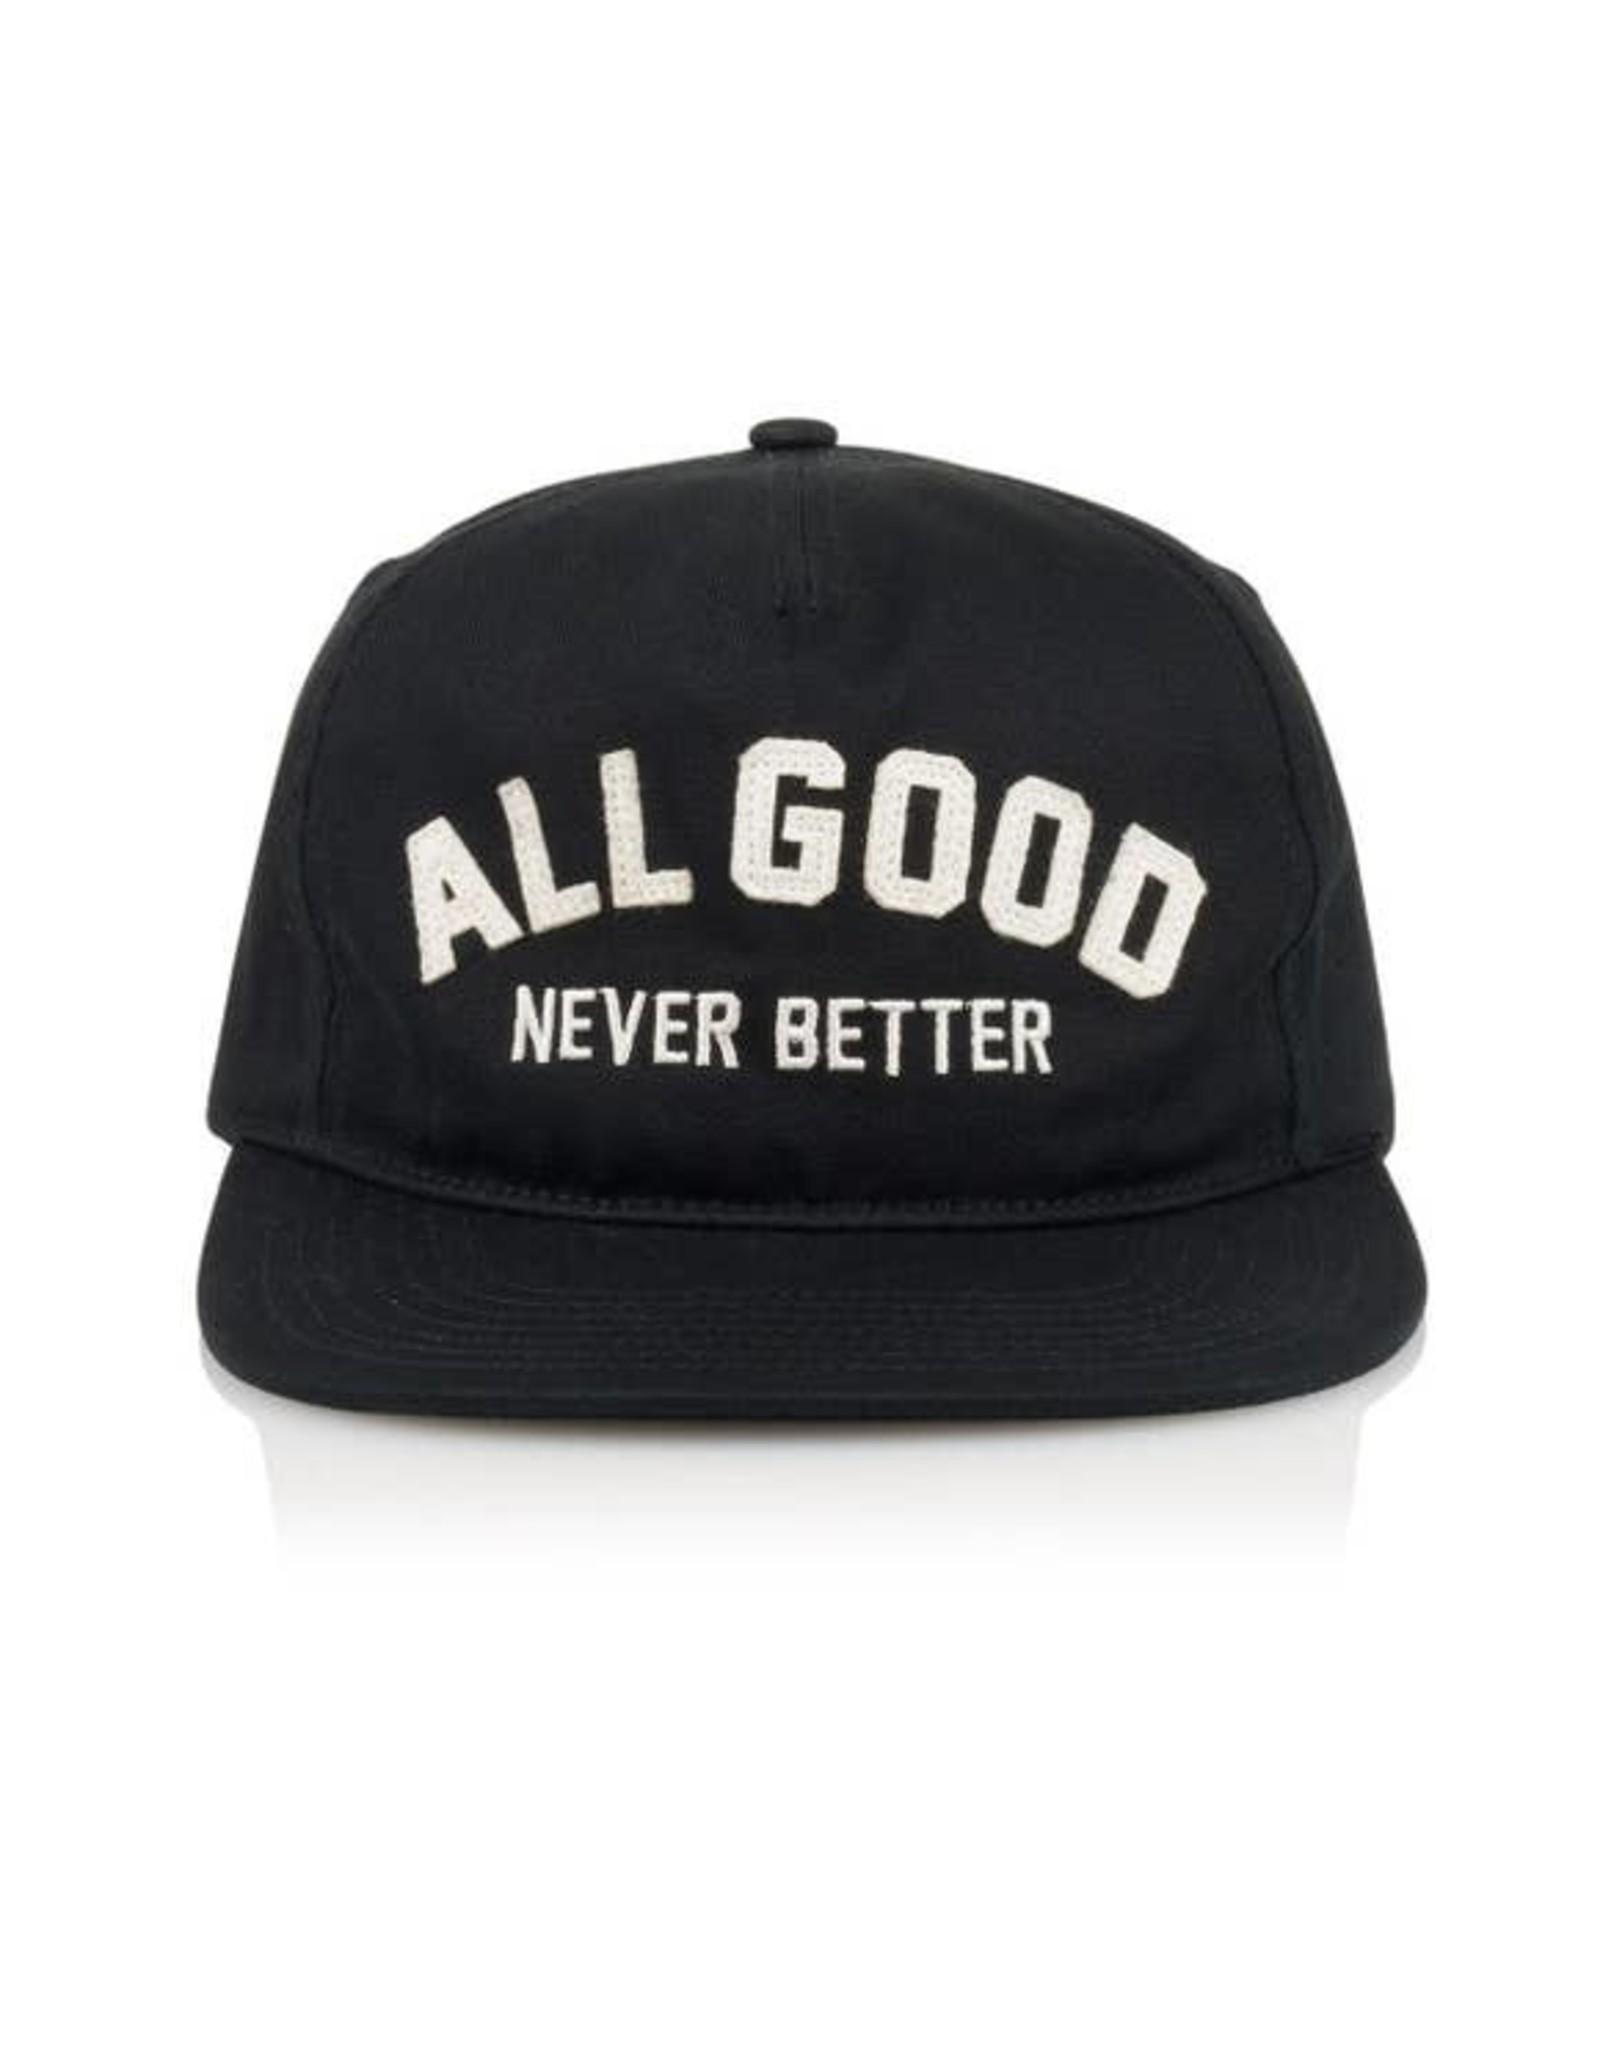 All Good Buckeye Cap- Black